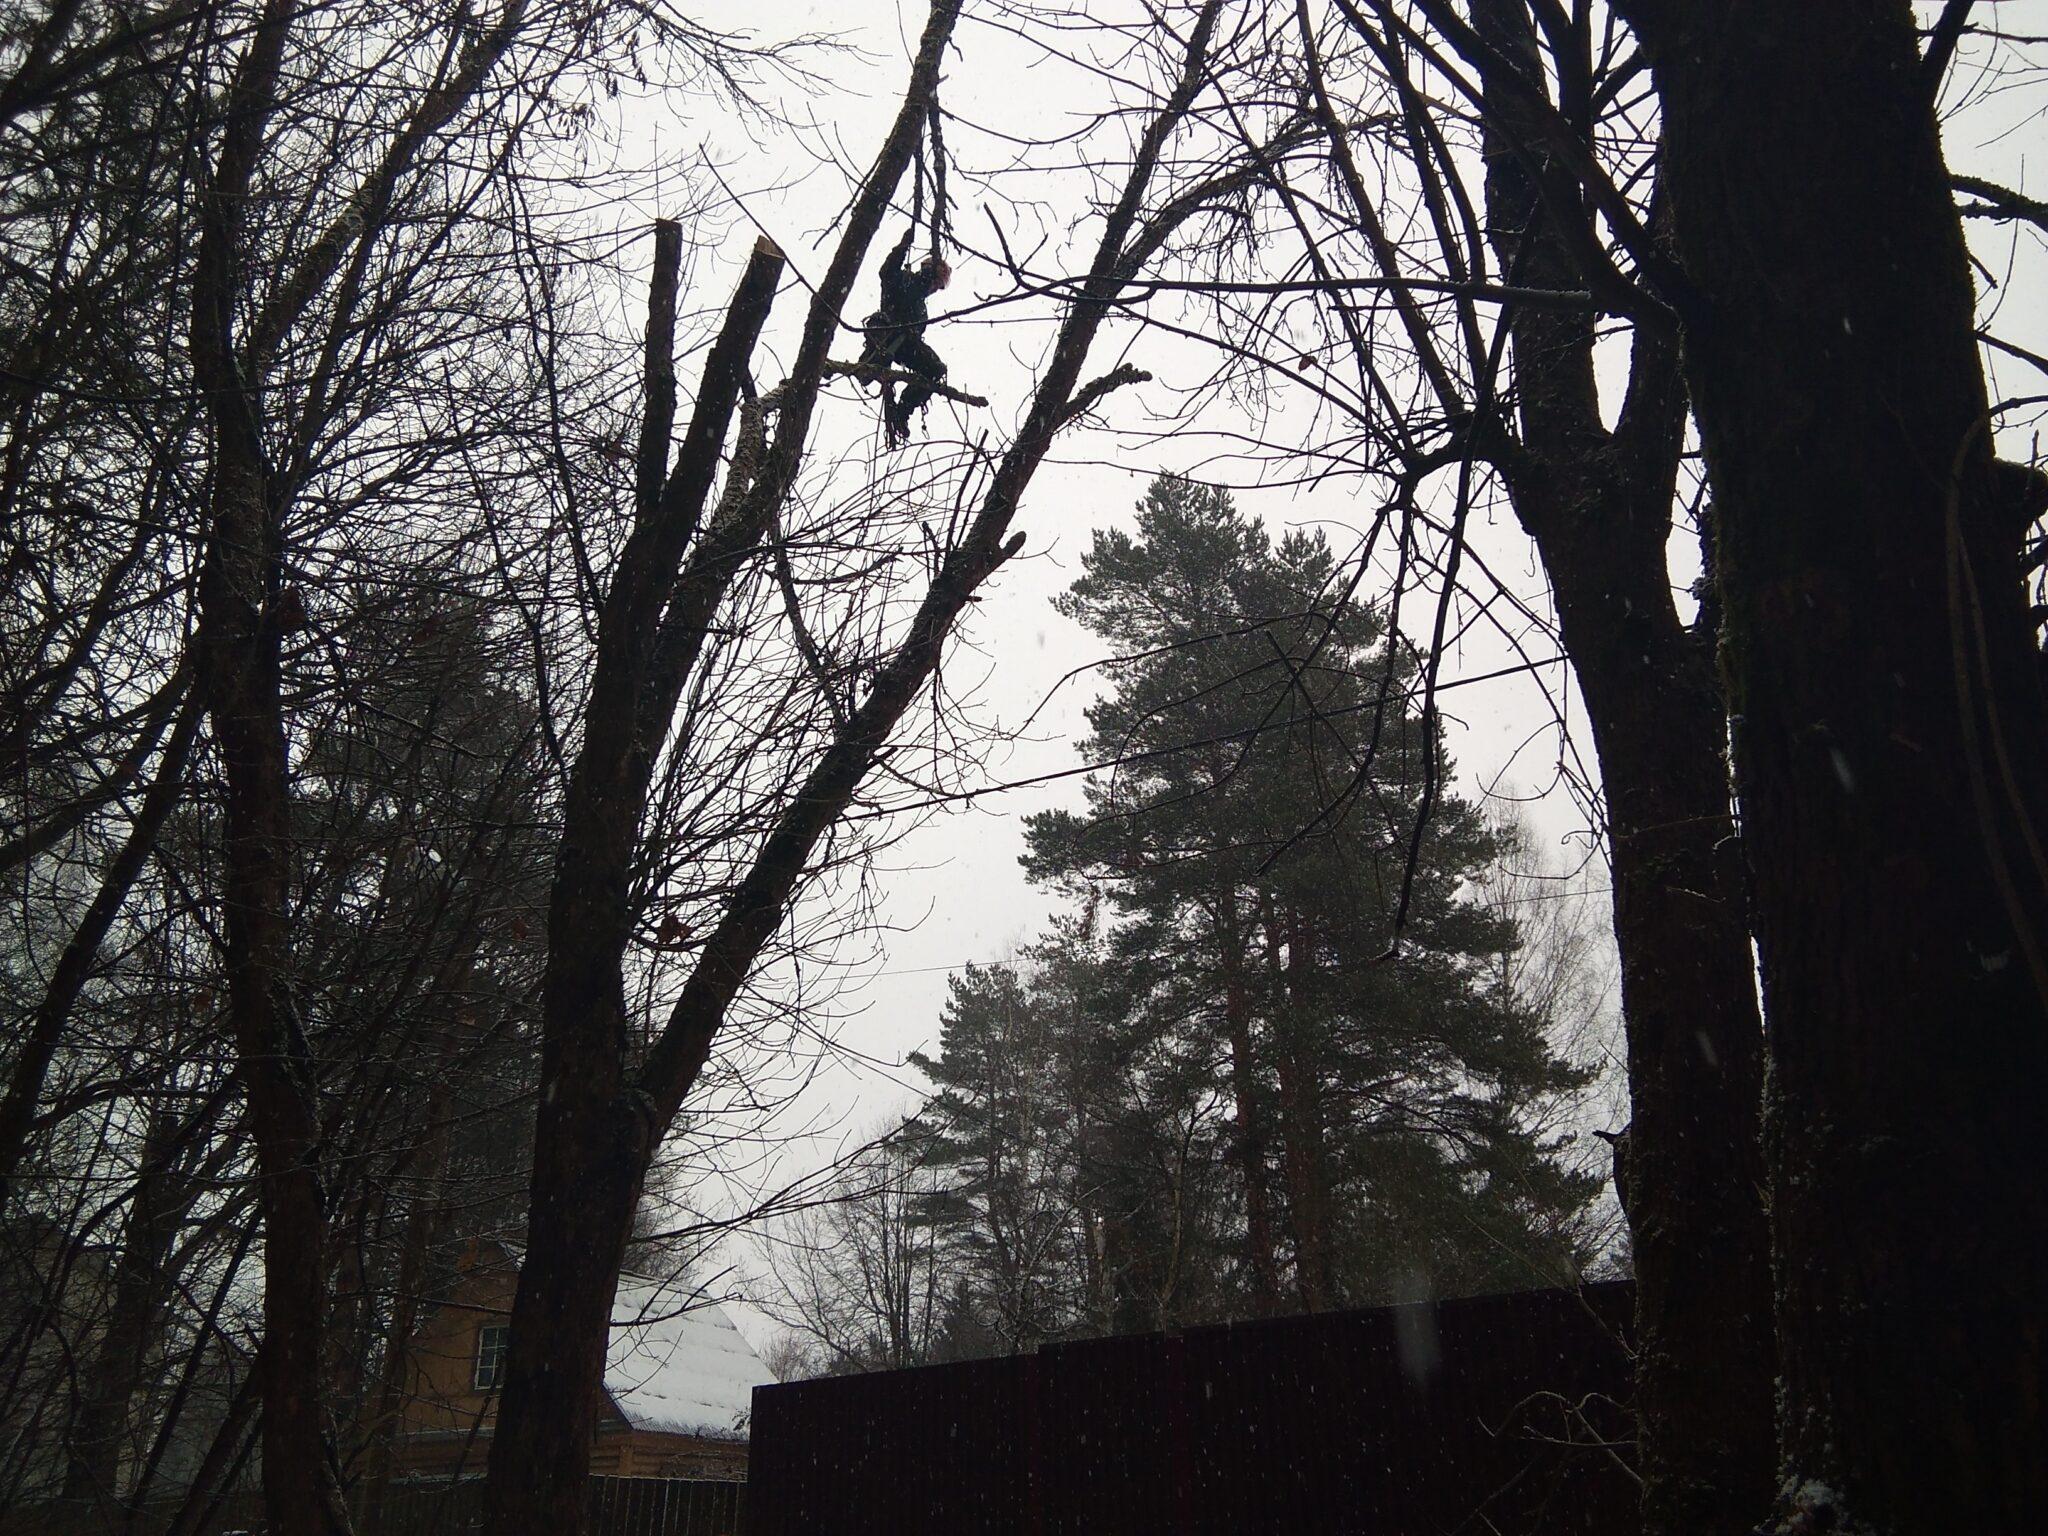 Обрезка деревьев в Пушкинском районе, поселок Зеленоградский